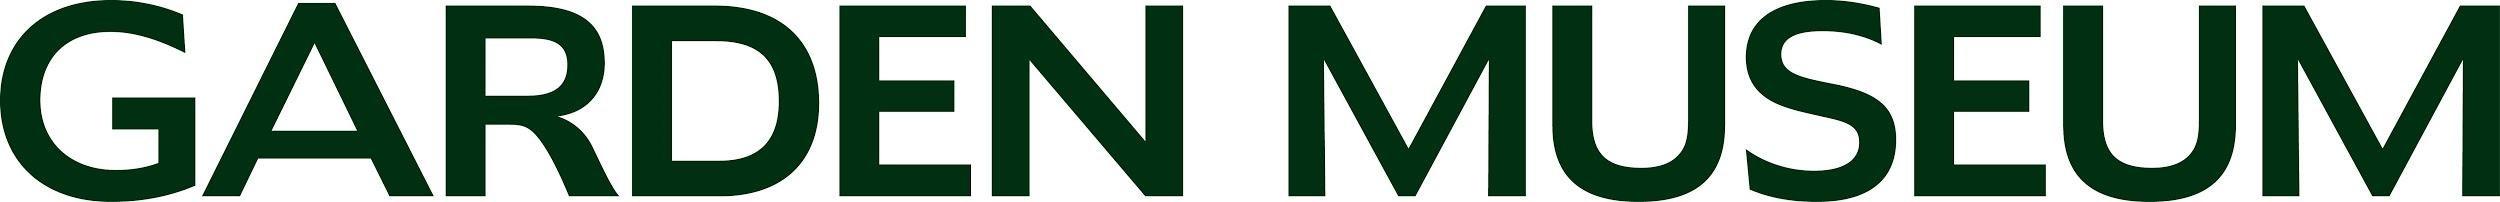 garden museum logo